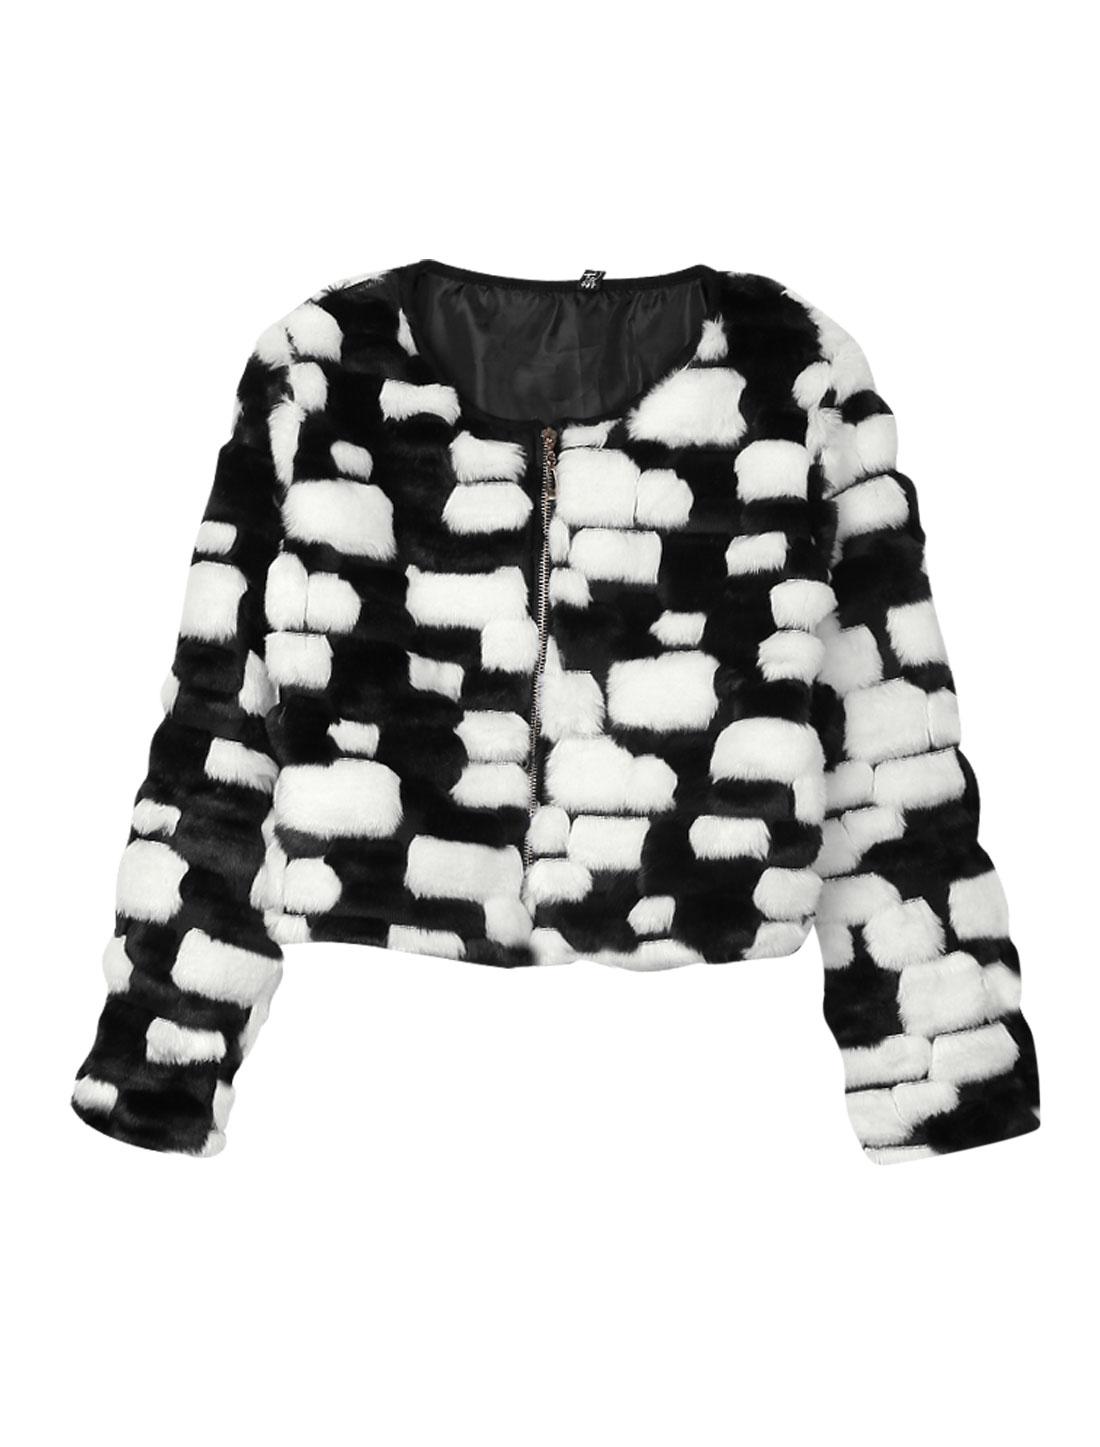 Women Round Neck Zip Closure Contrast Color Leisure Plush Jacket Black White S